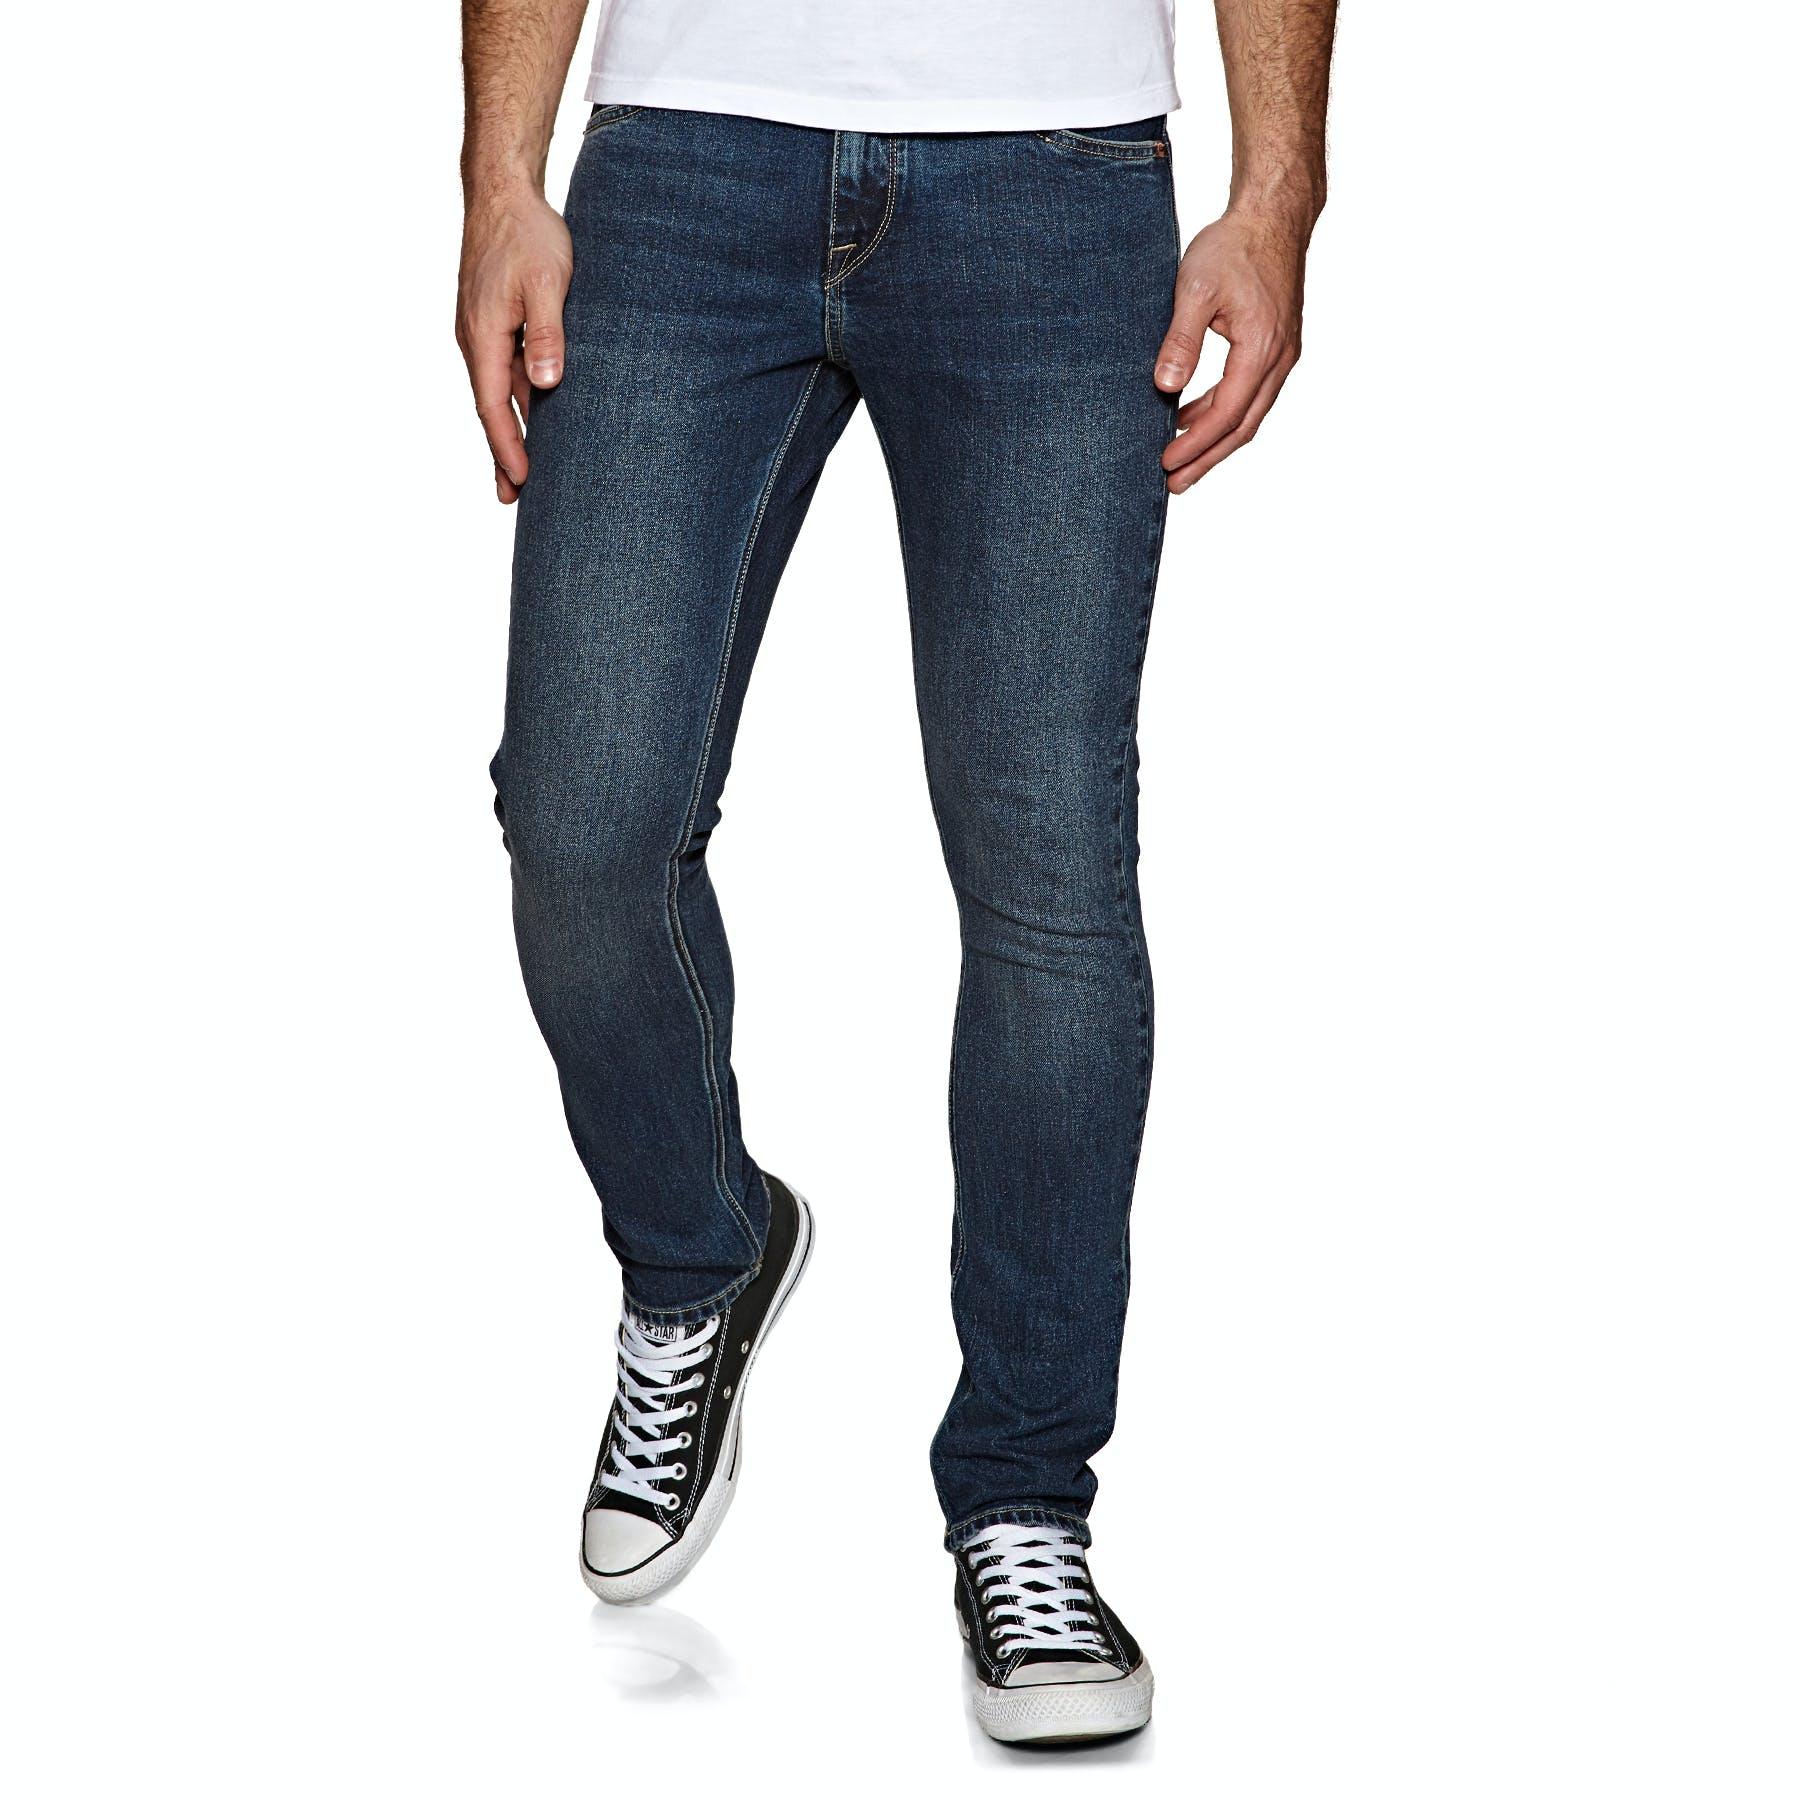 Jeans Volcom 2x4